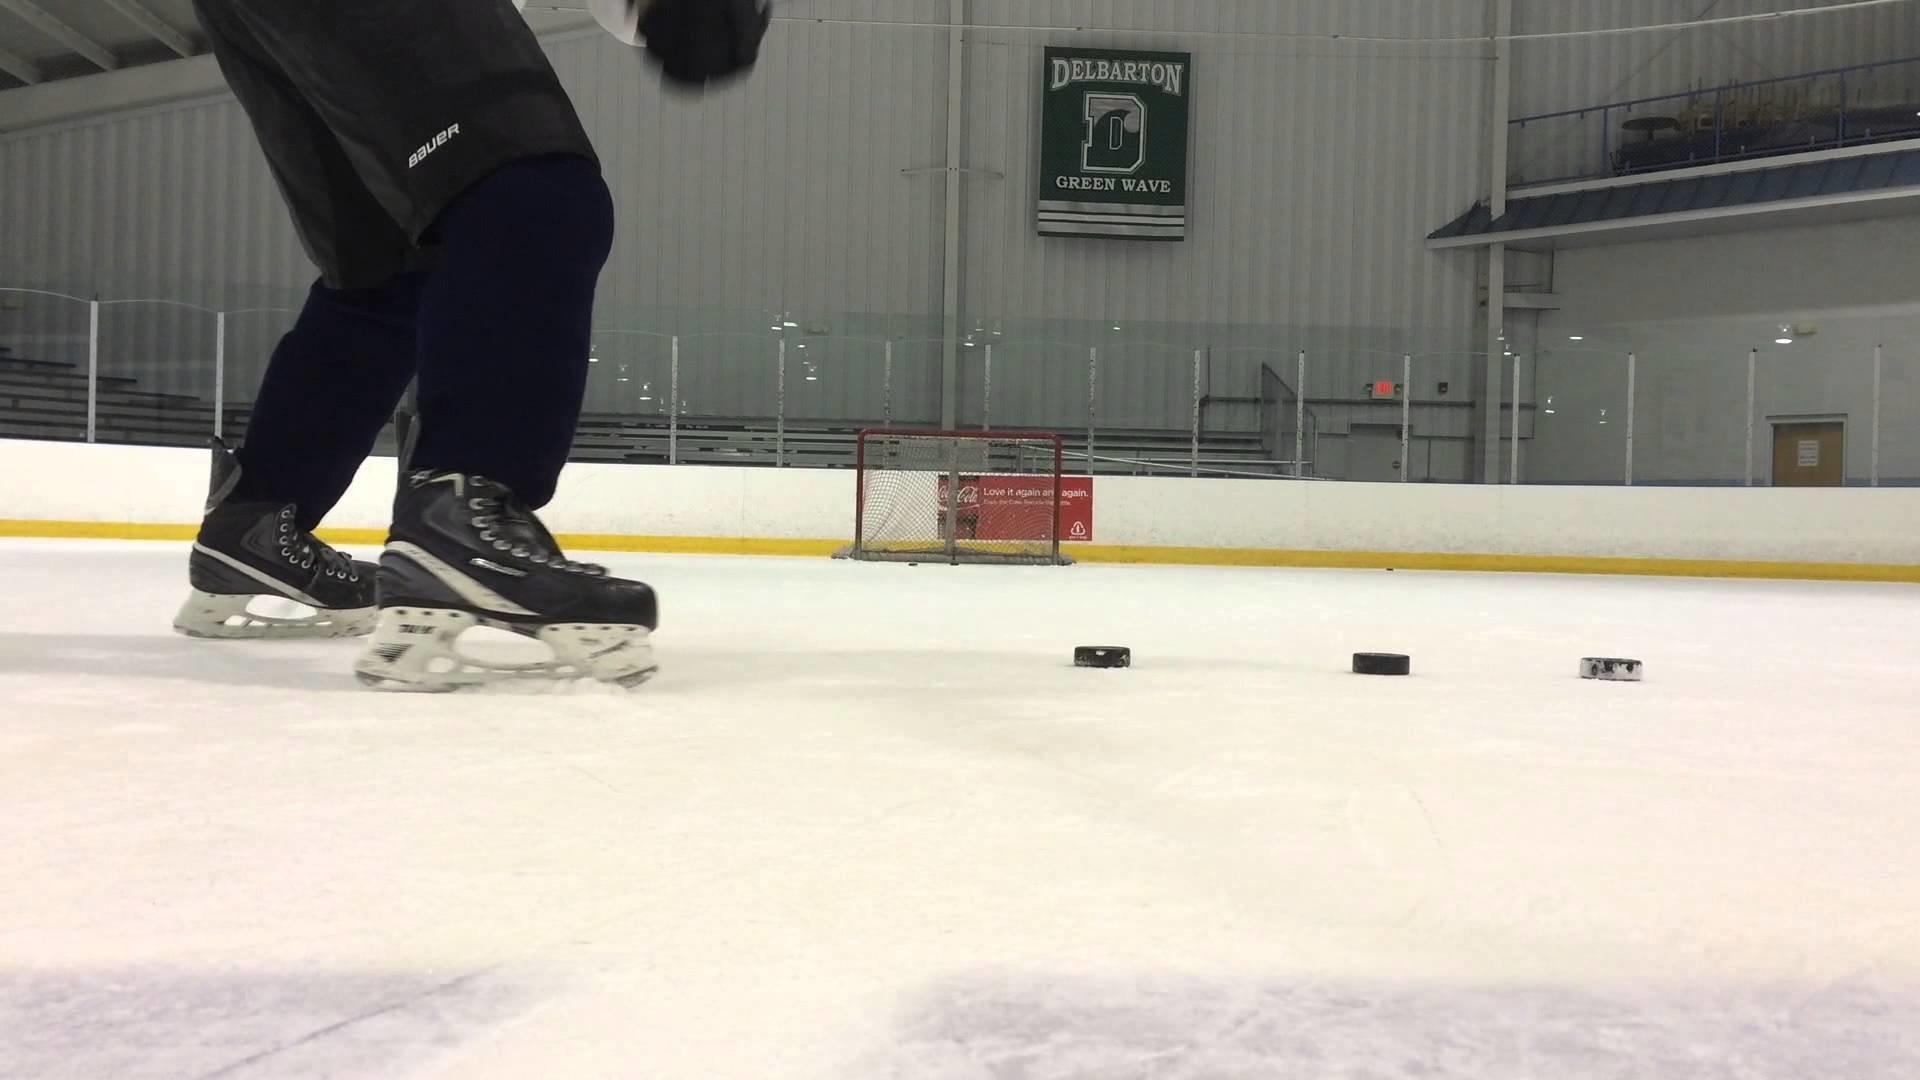 Bauer 1x rapid fired slap shots on ice hockey Upper Corner Hockey – YouTube